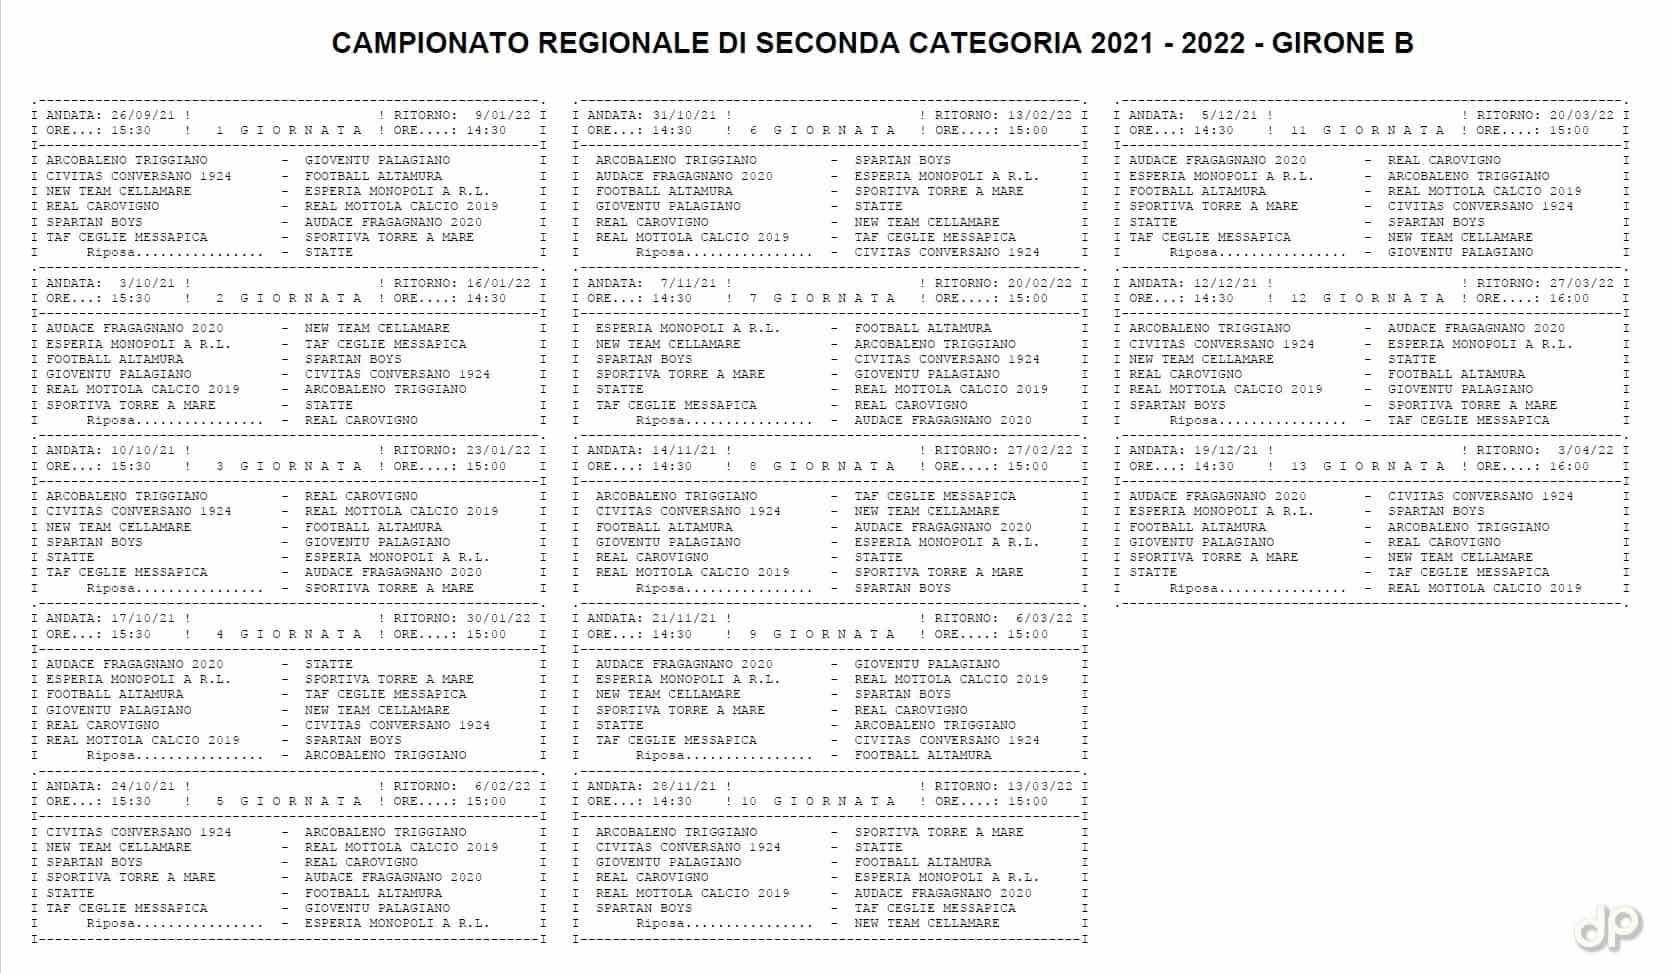 Calendario Seconda Categoria pugliese girone B 2021-22